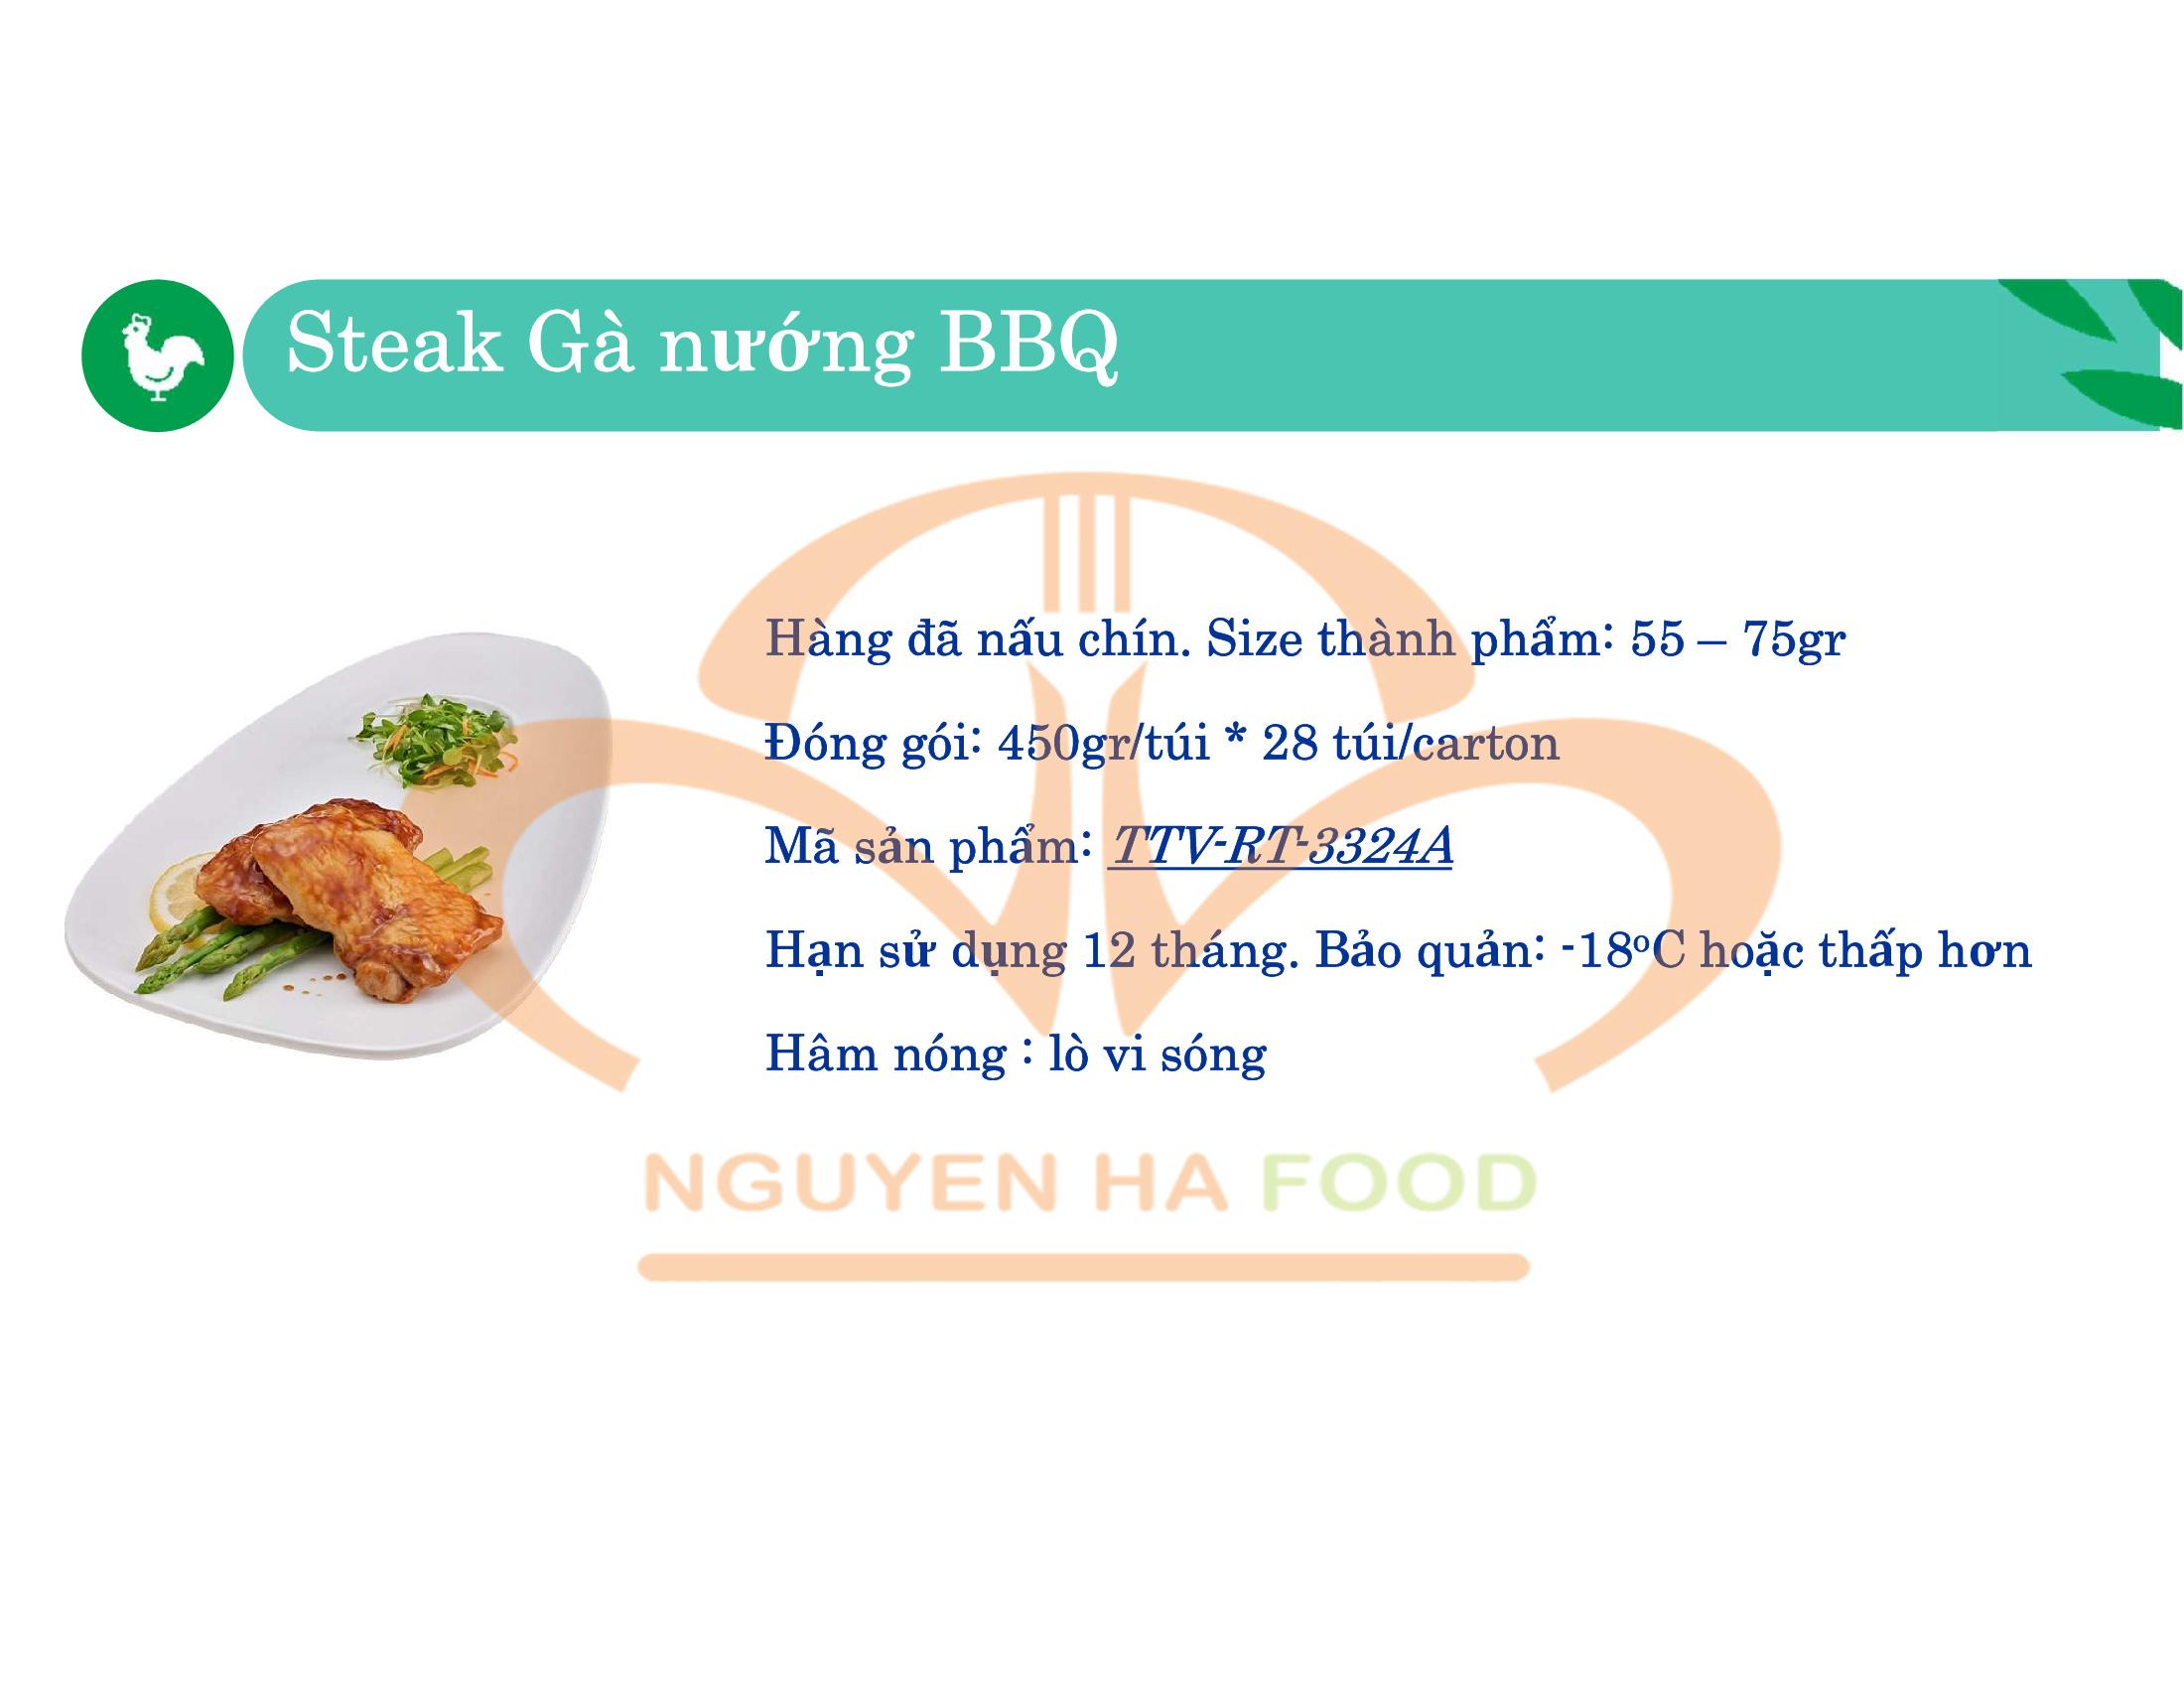 01 STEAK GA NUONG BBQ CP NGUYEN HA FOOD